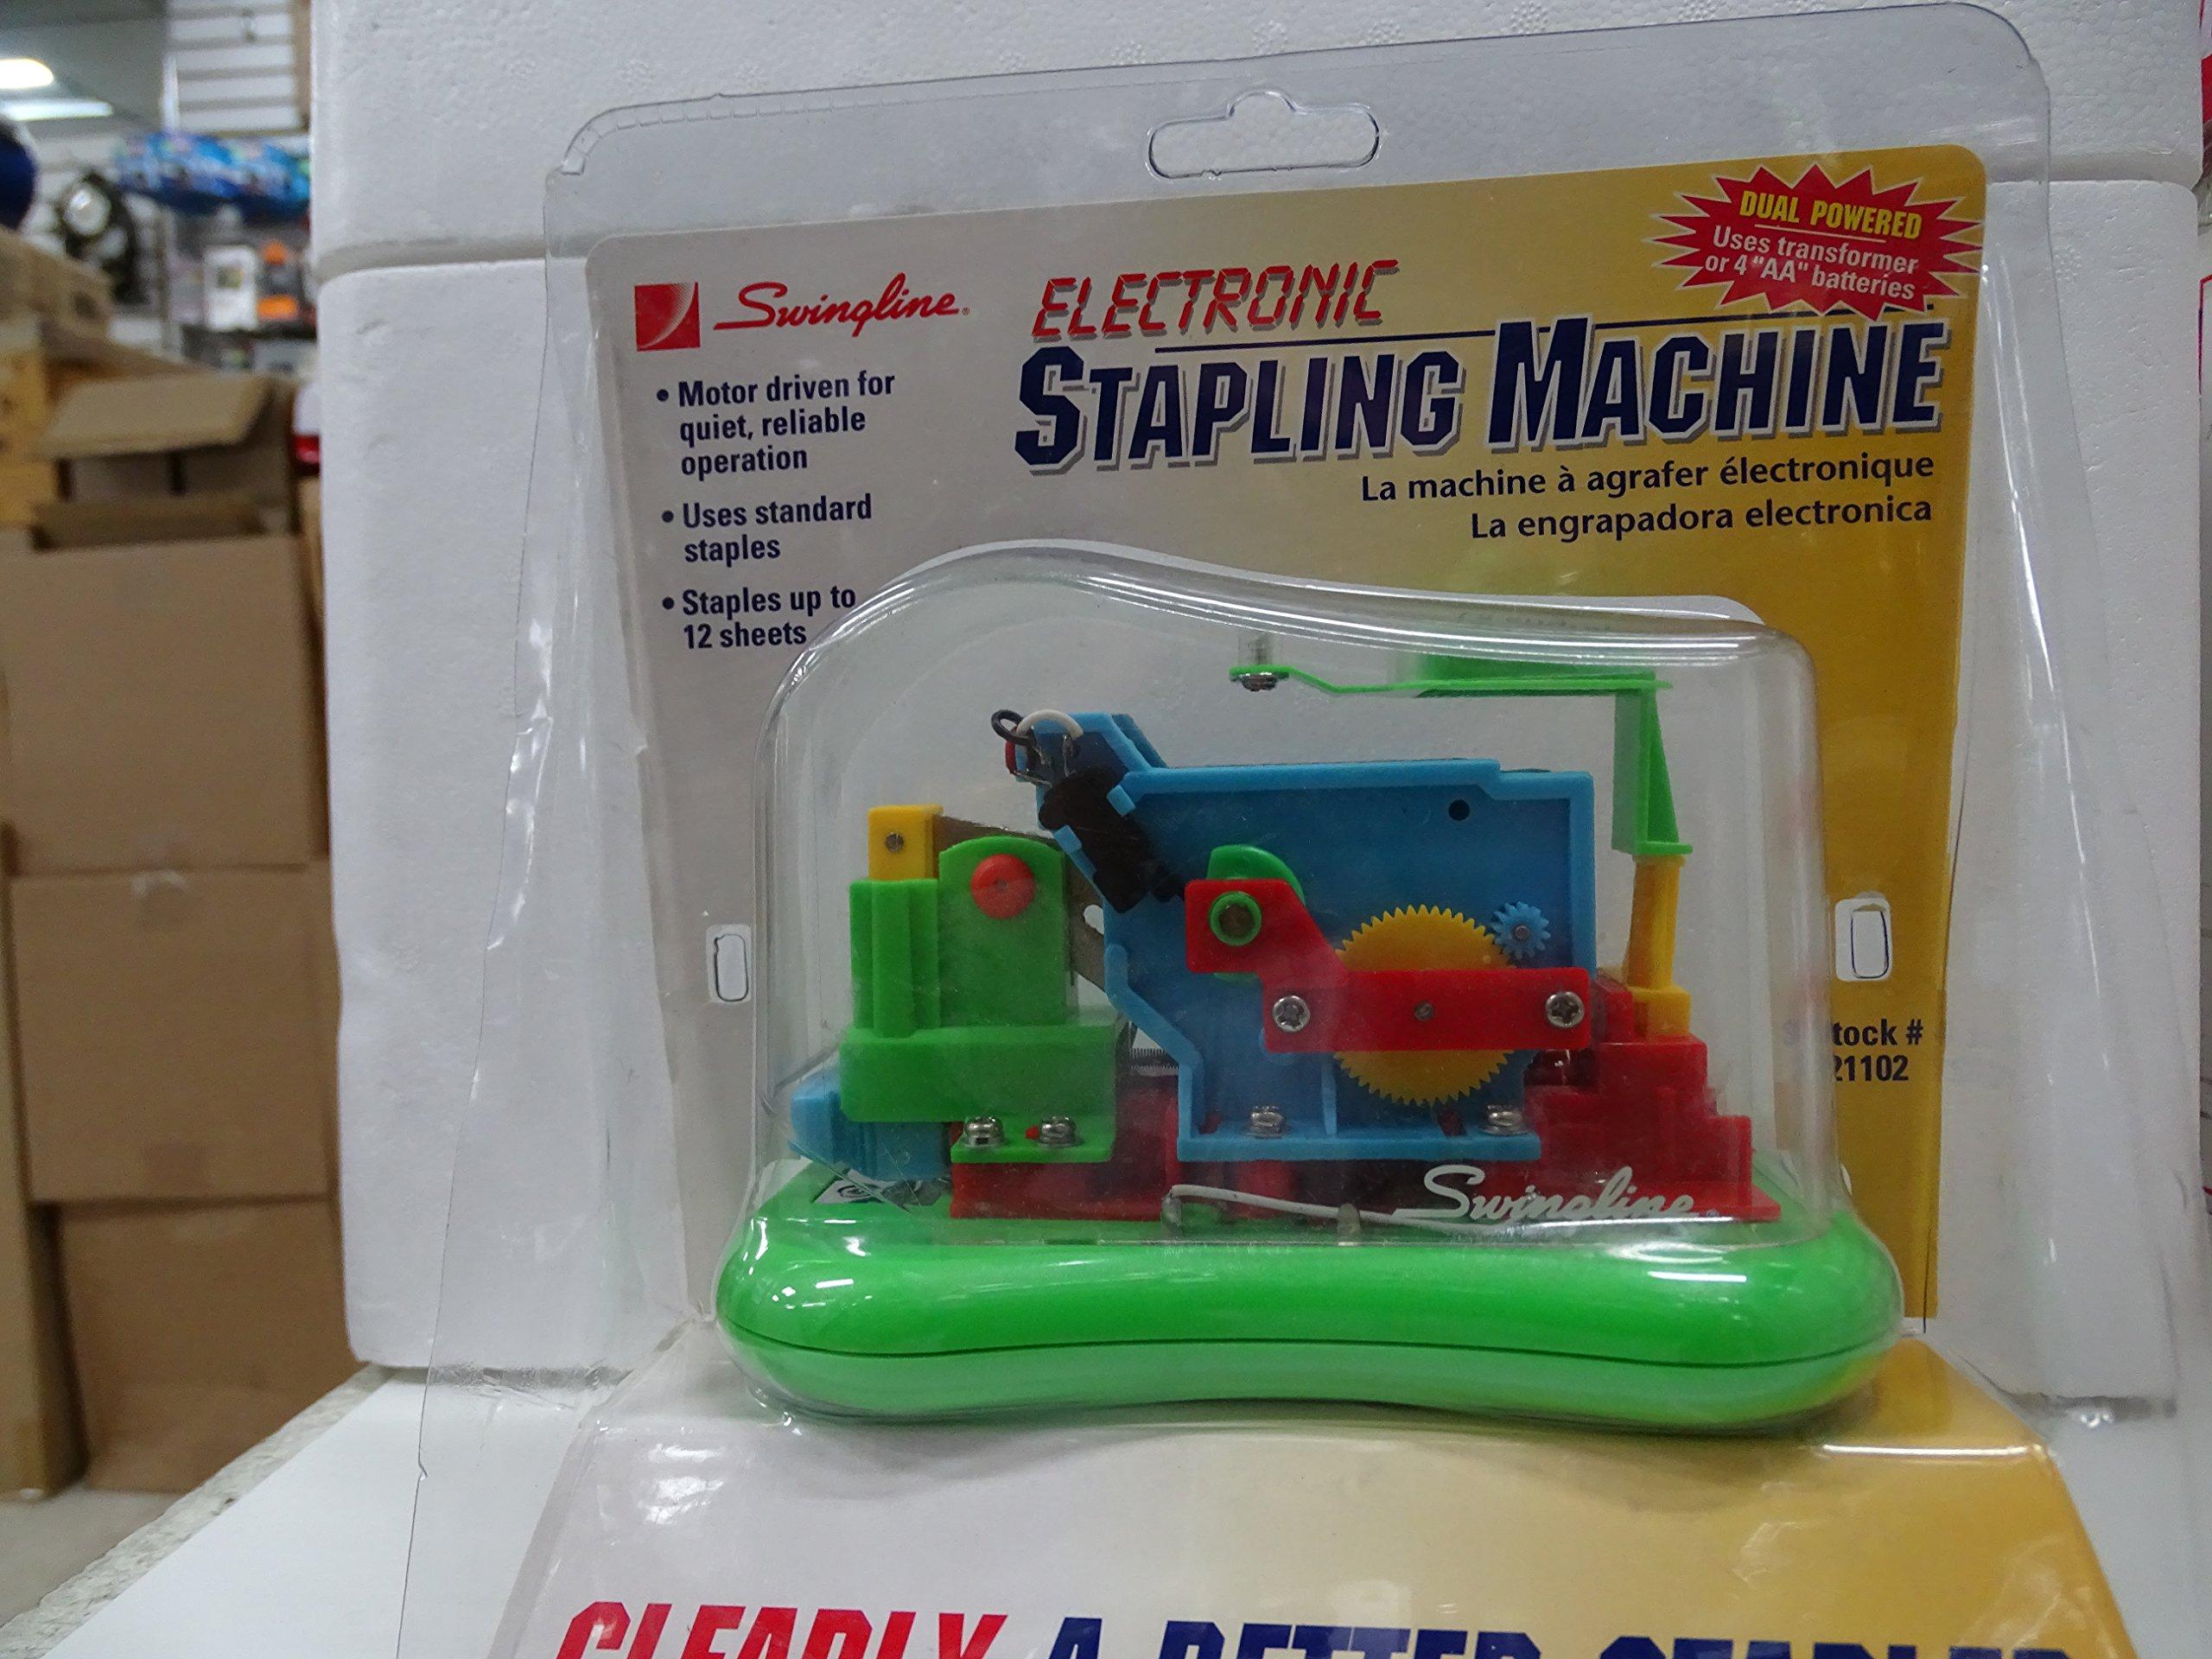 electronicstapling machine